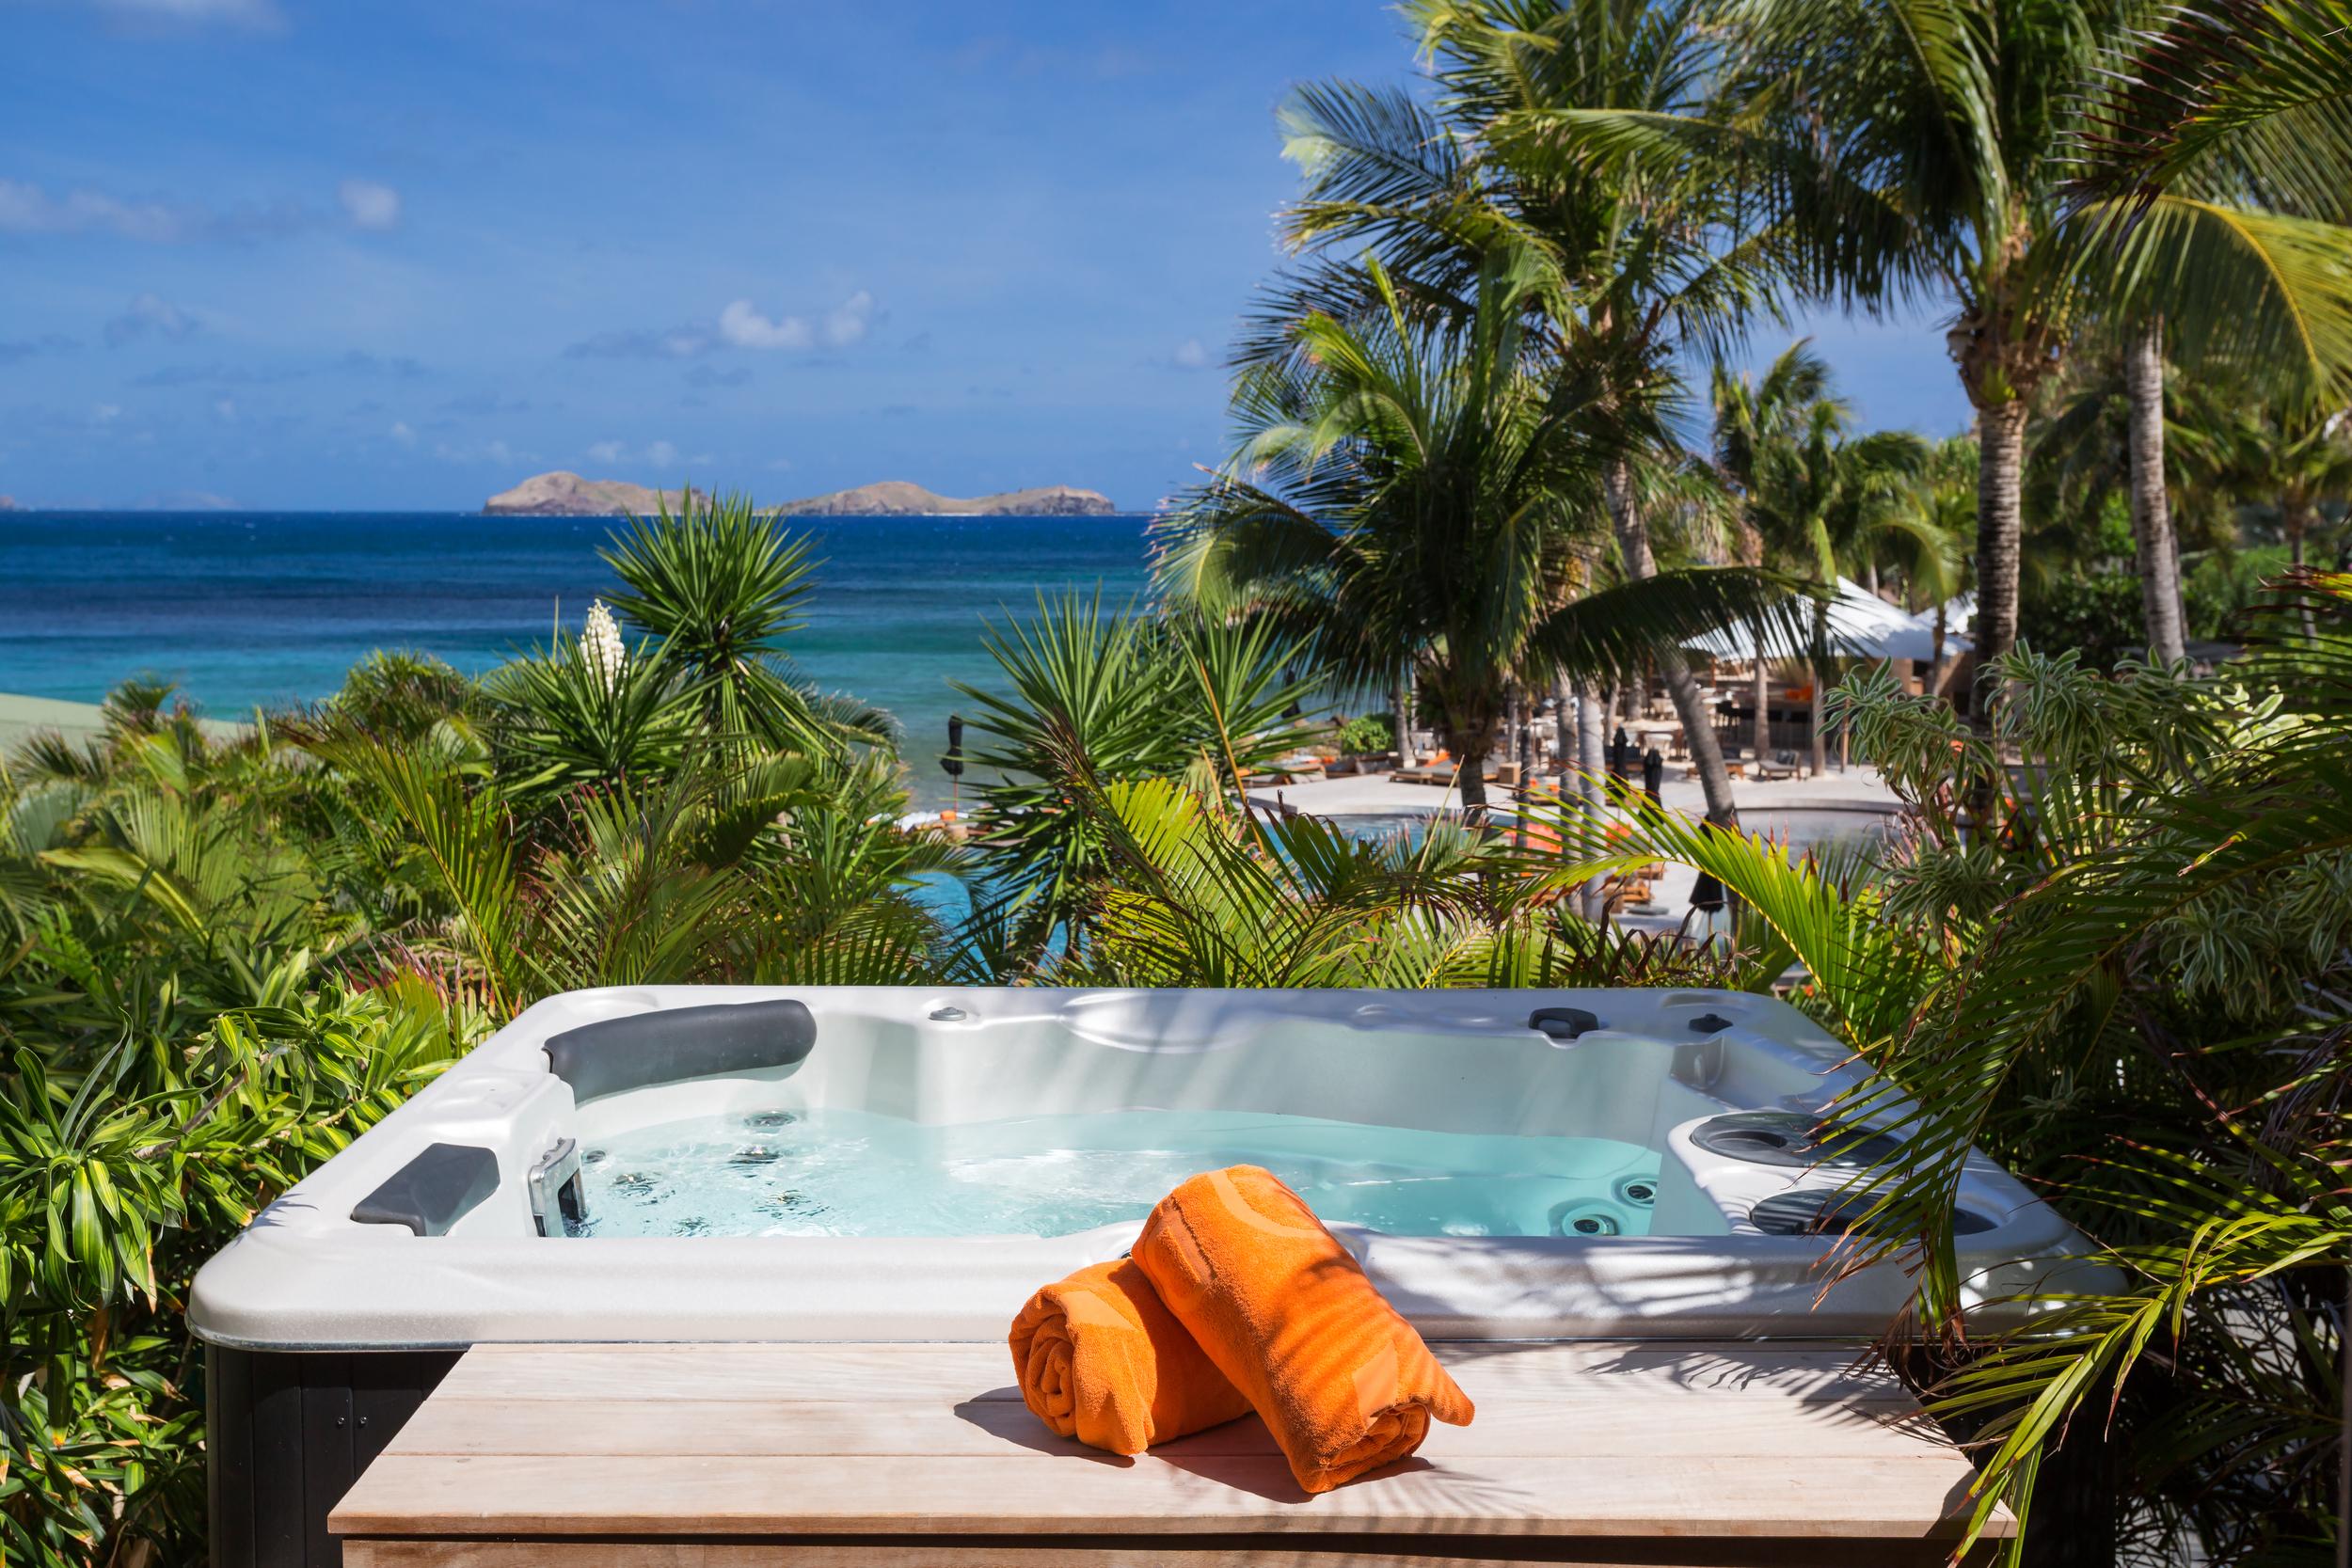 caribbean_StBarths_Hotel_Christopher_Ocean Jacuzzi Suite 2.jpg